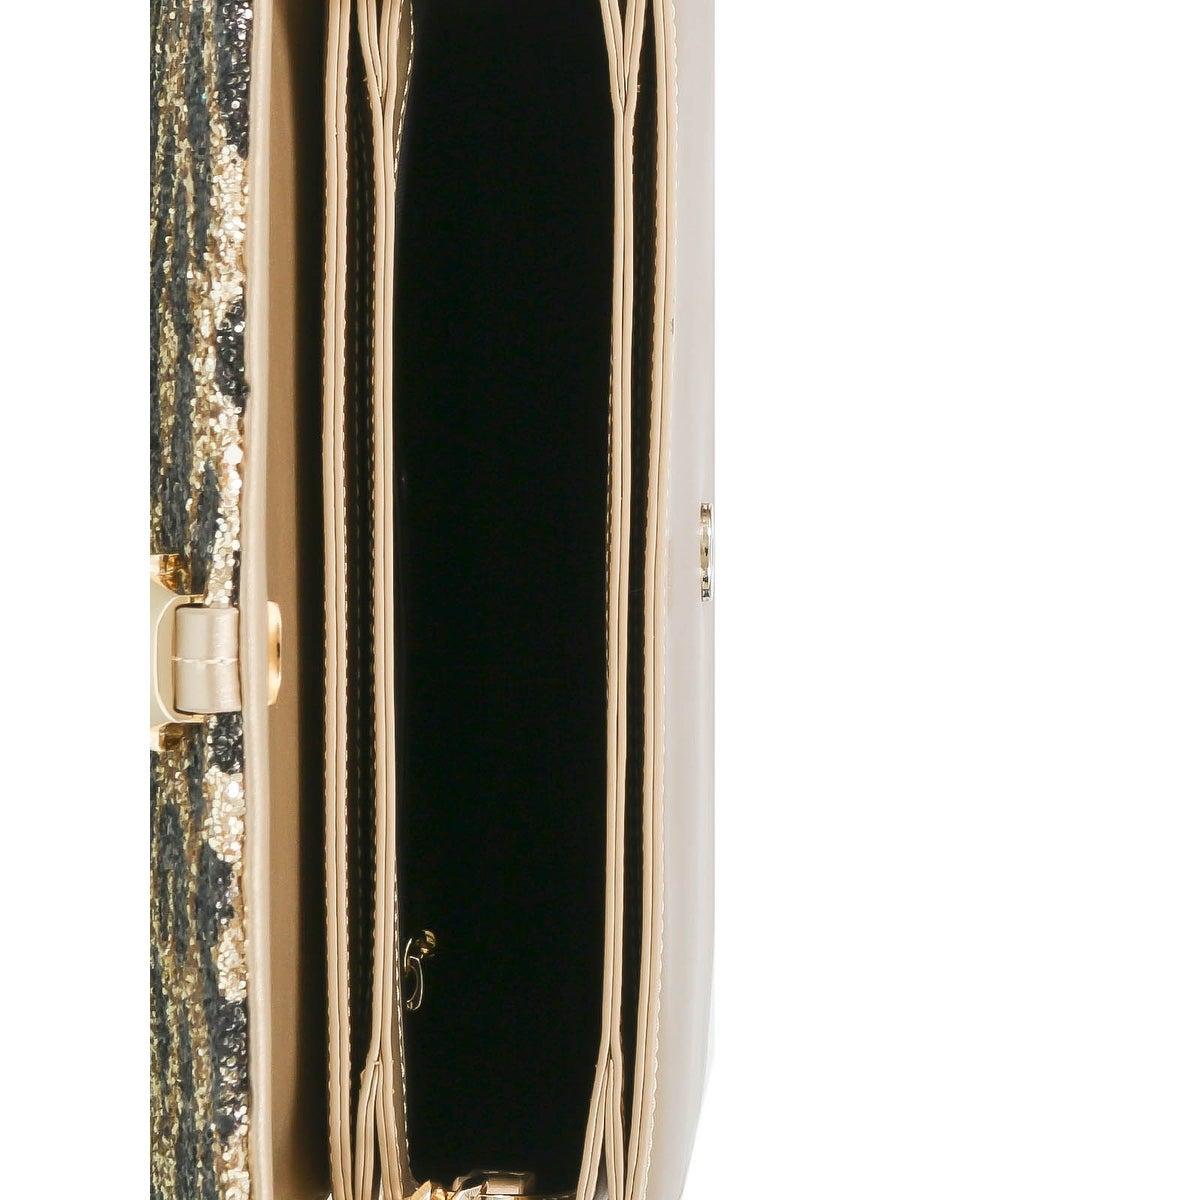 Roberto Cavalli GQLPAO H00 Light Gold//Noir Milano RMX 003 Sac à dos